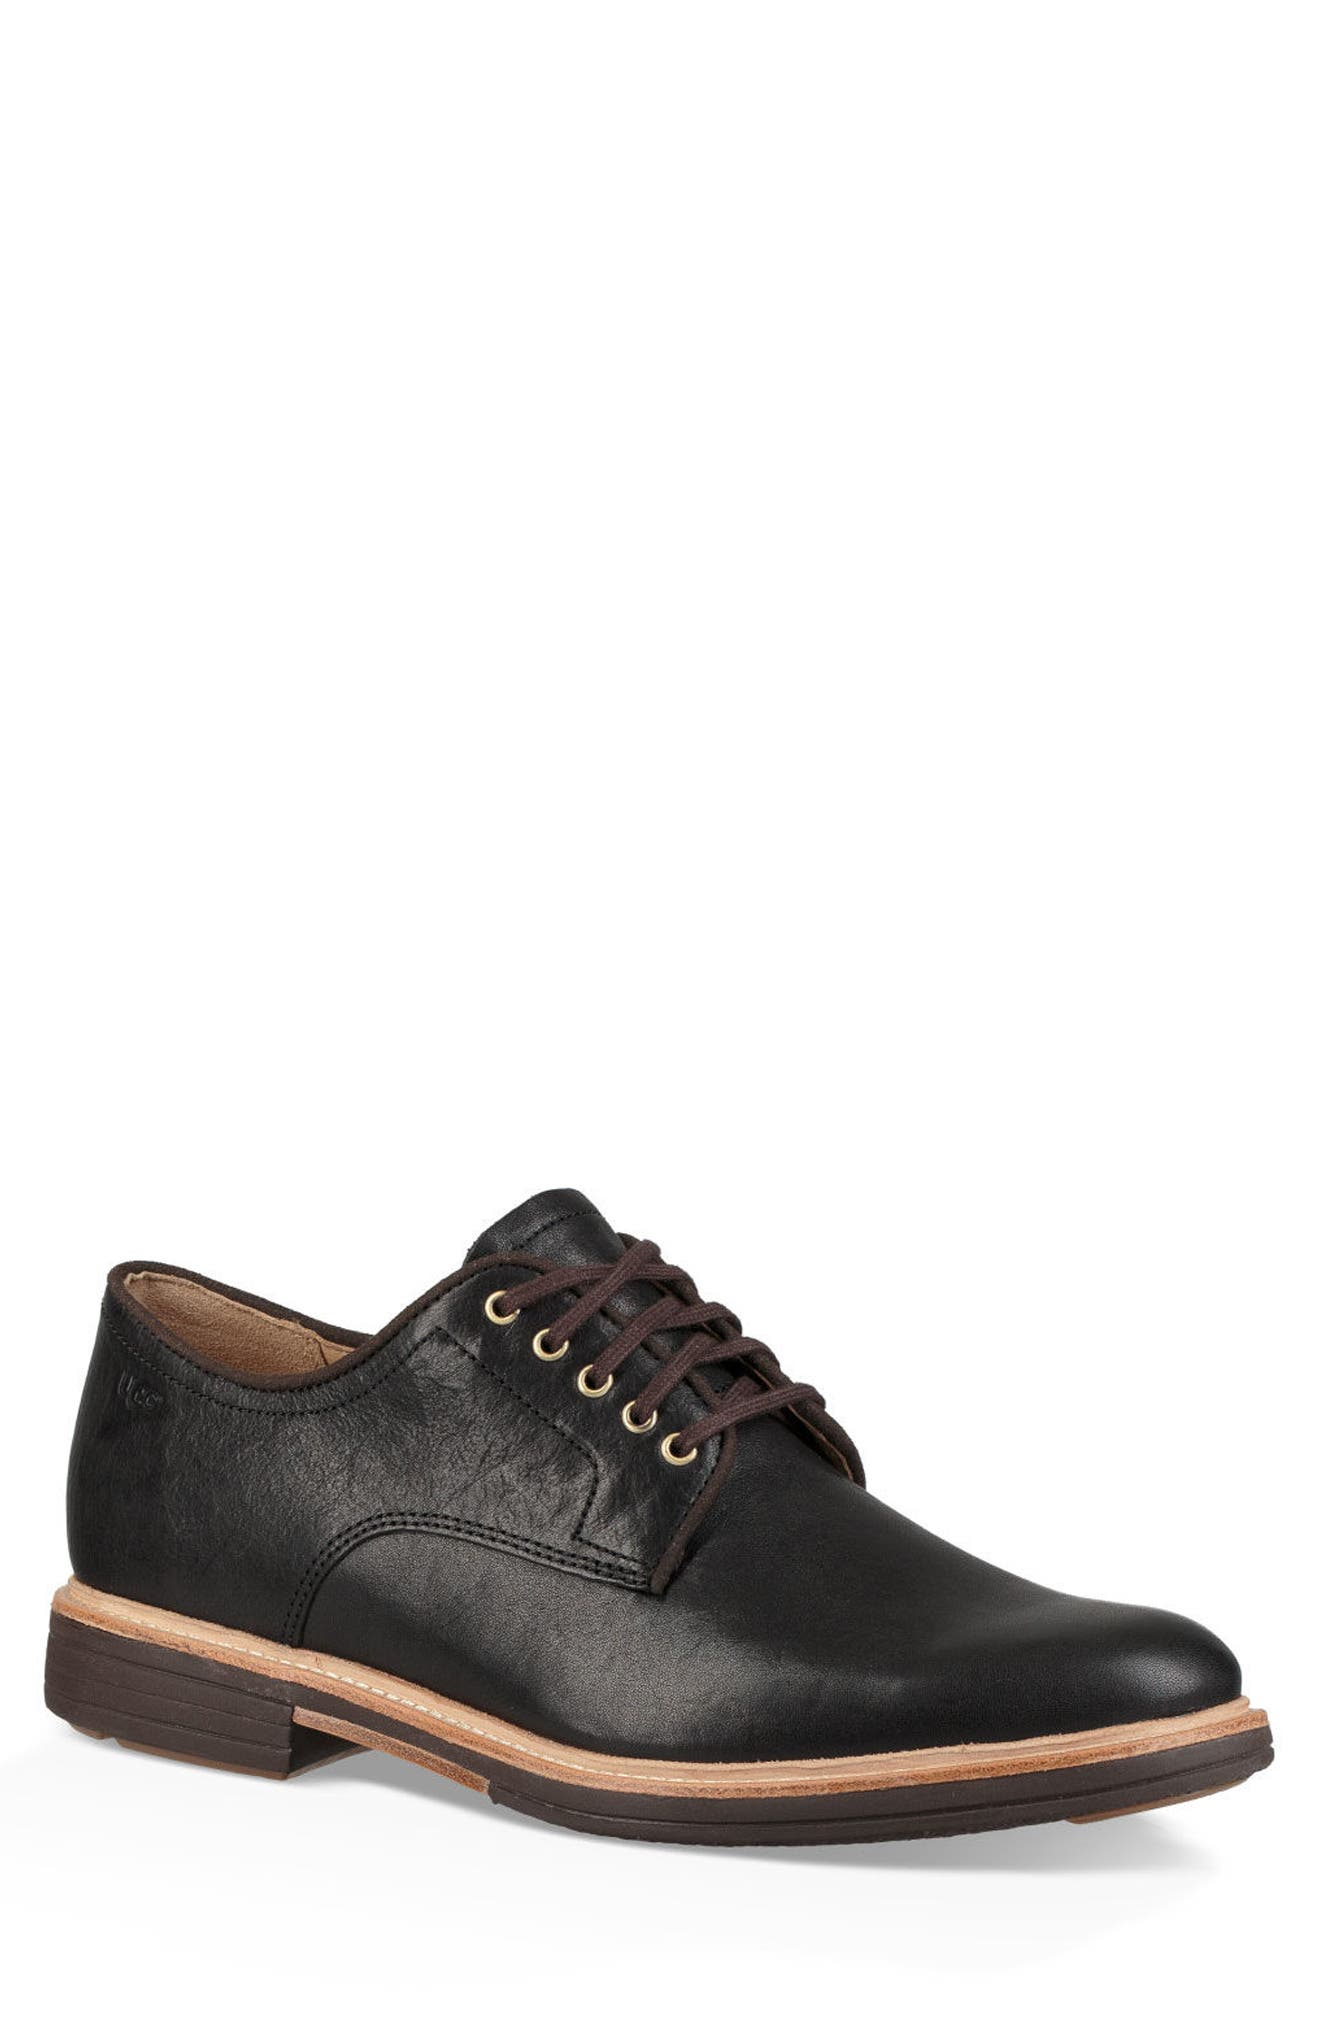 Jovin Buck Shoe,                         Main,                         color, BLACK LEATHER/SUEDE